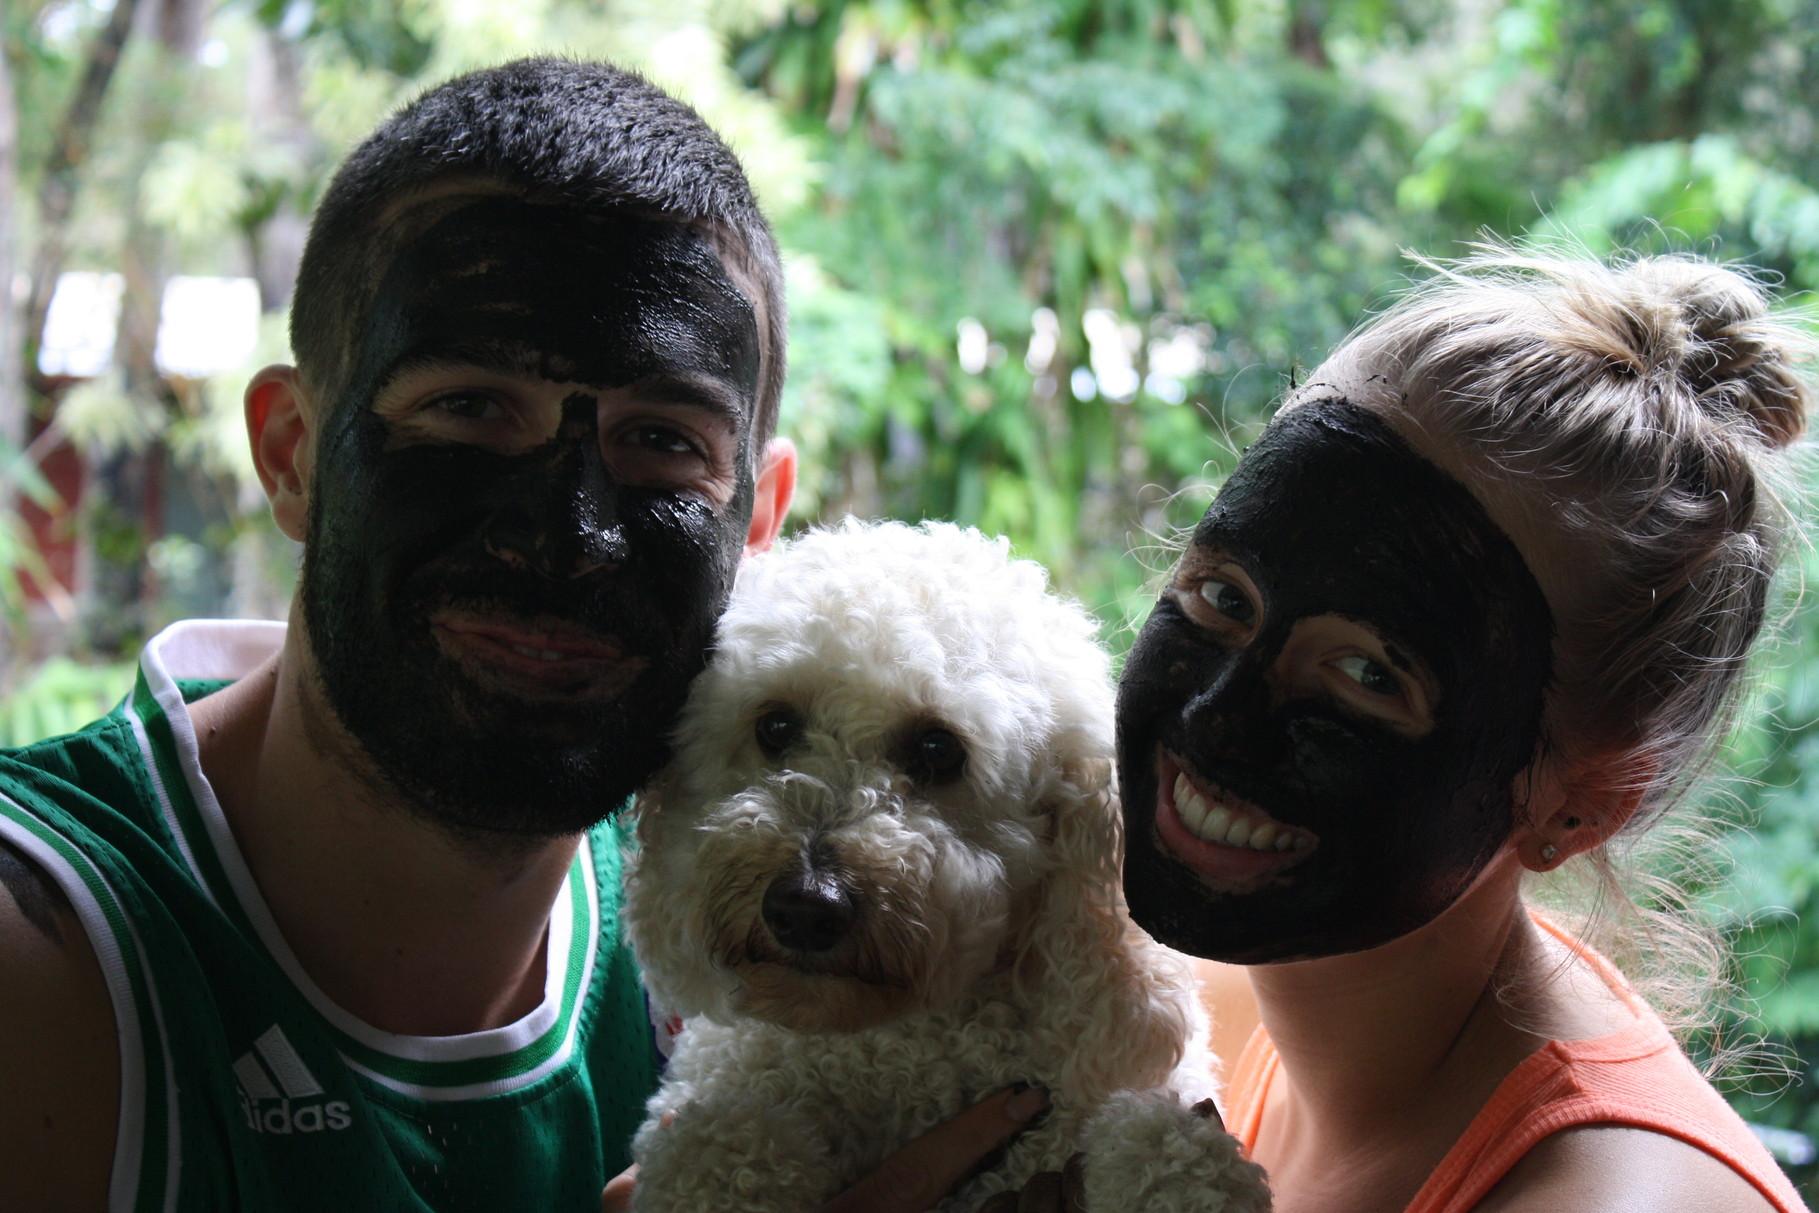 BUY RYL Moor Mud Blackhead & Pore Reducer